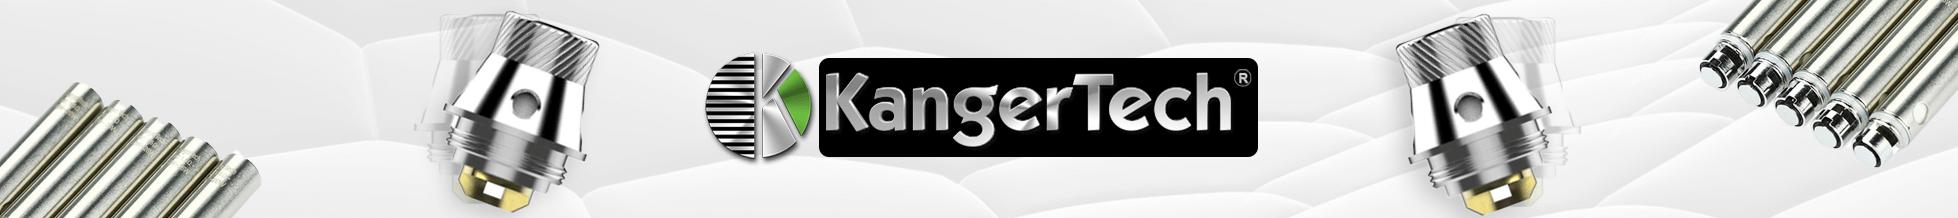 kangertech-categorty-banner.png